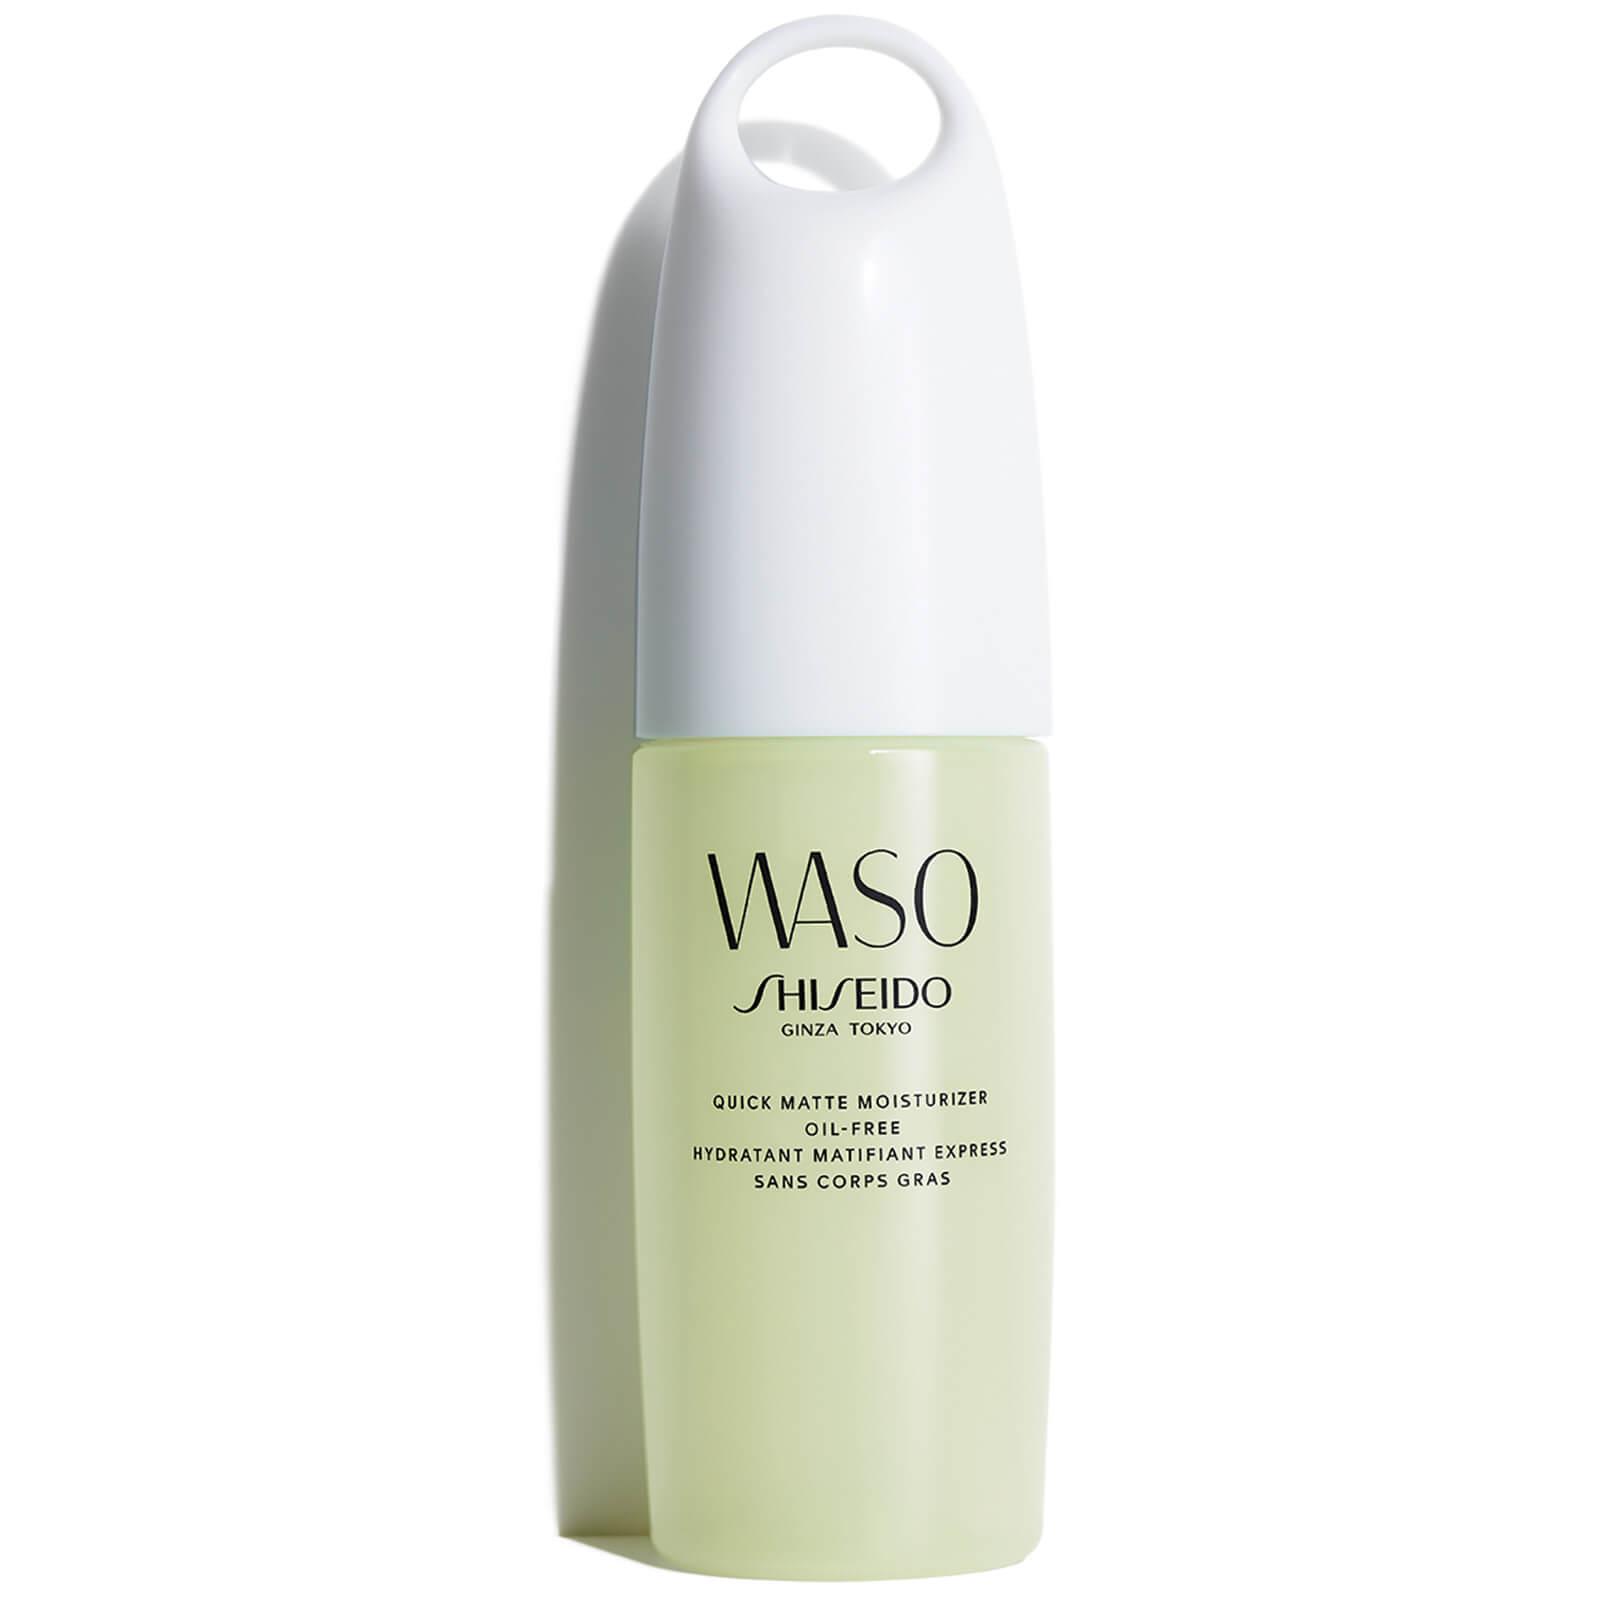 Shiseido WASO Quick Matte Oil Free Moisturizer 75ml